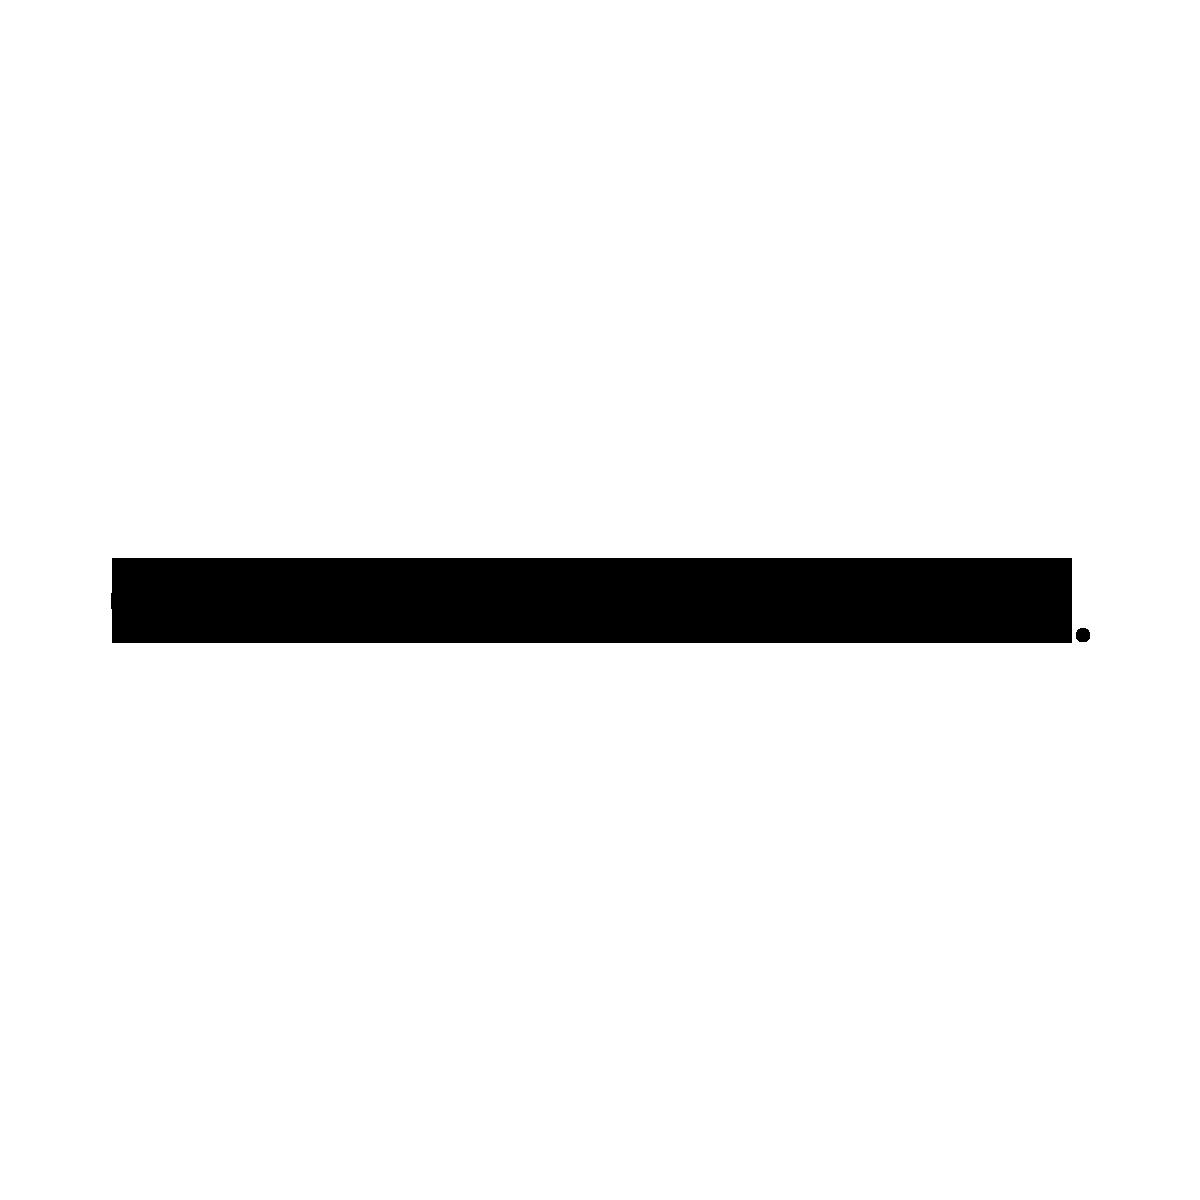 Business-bag-hand-buffed-leather-medium-Brown